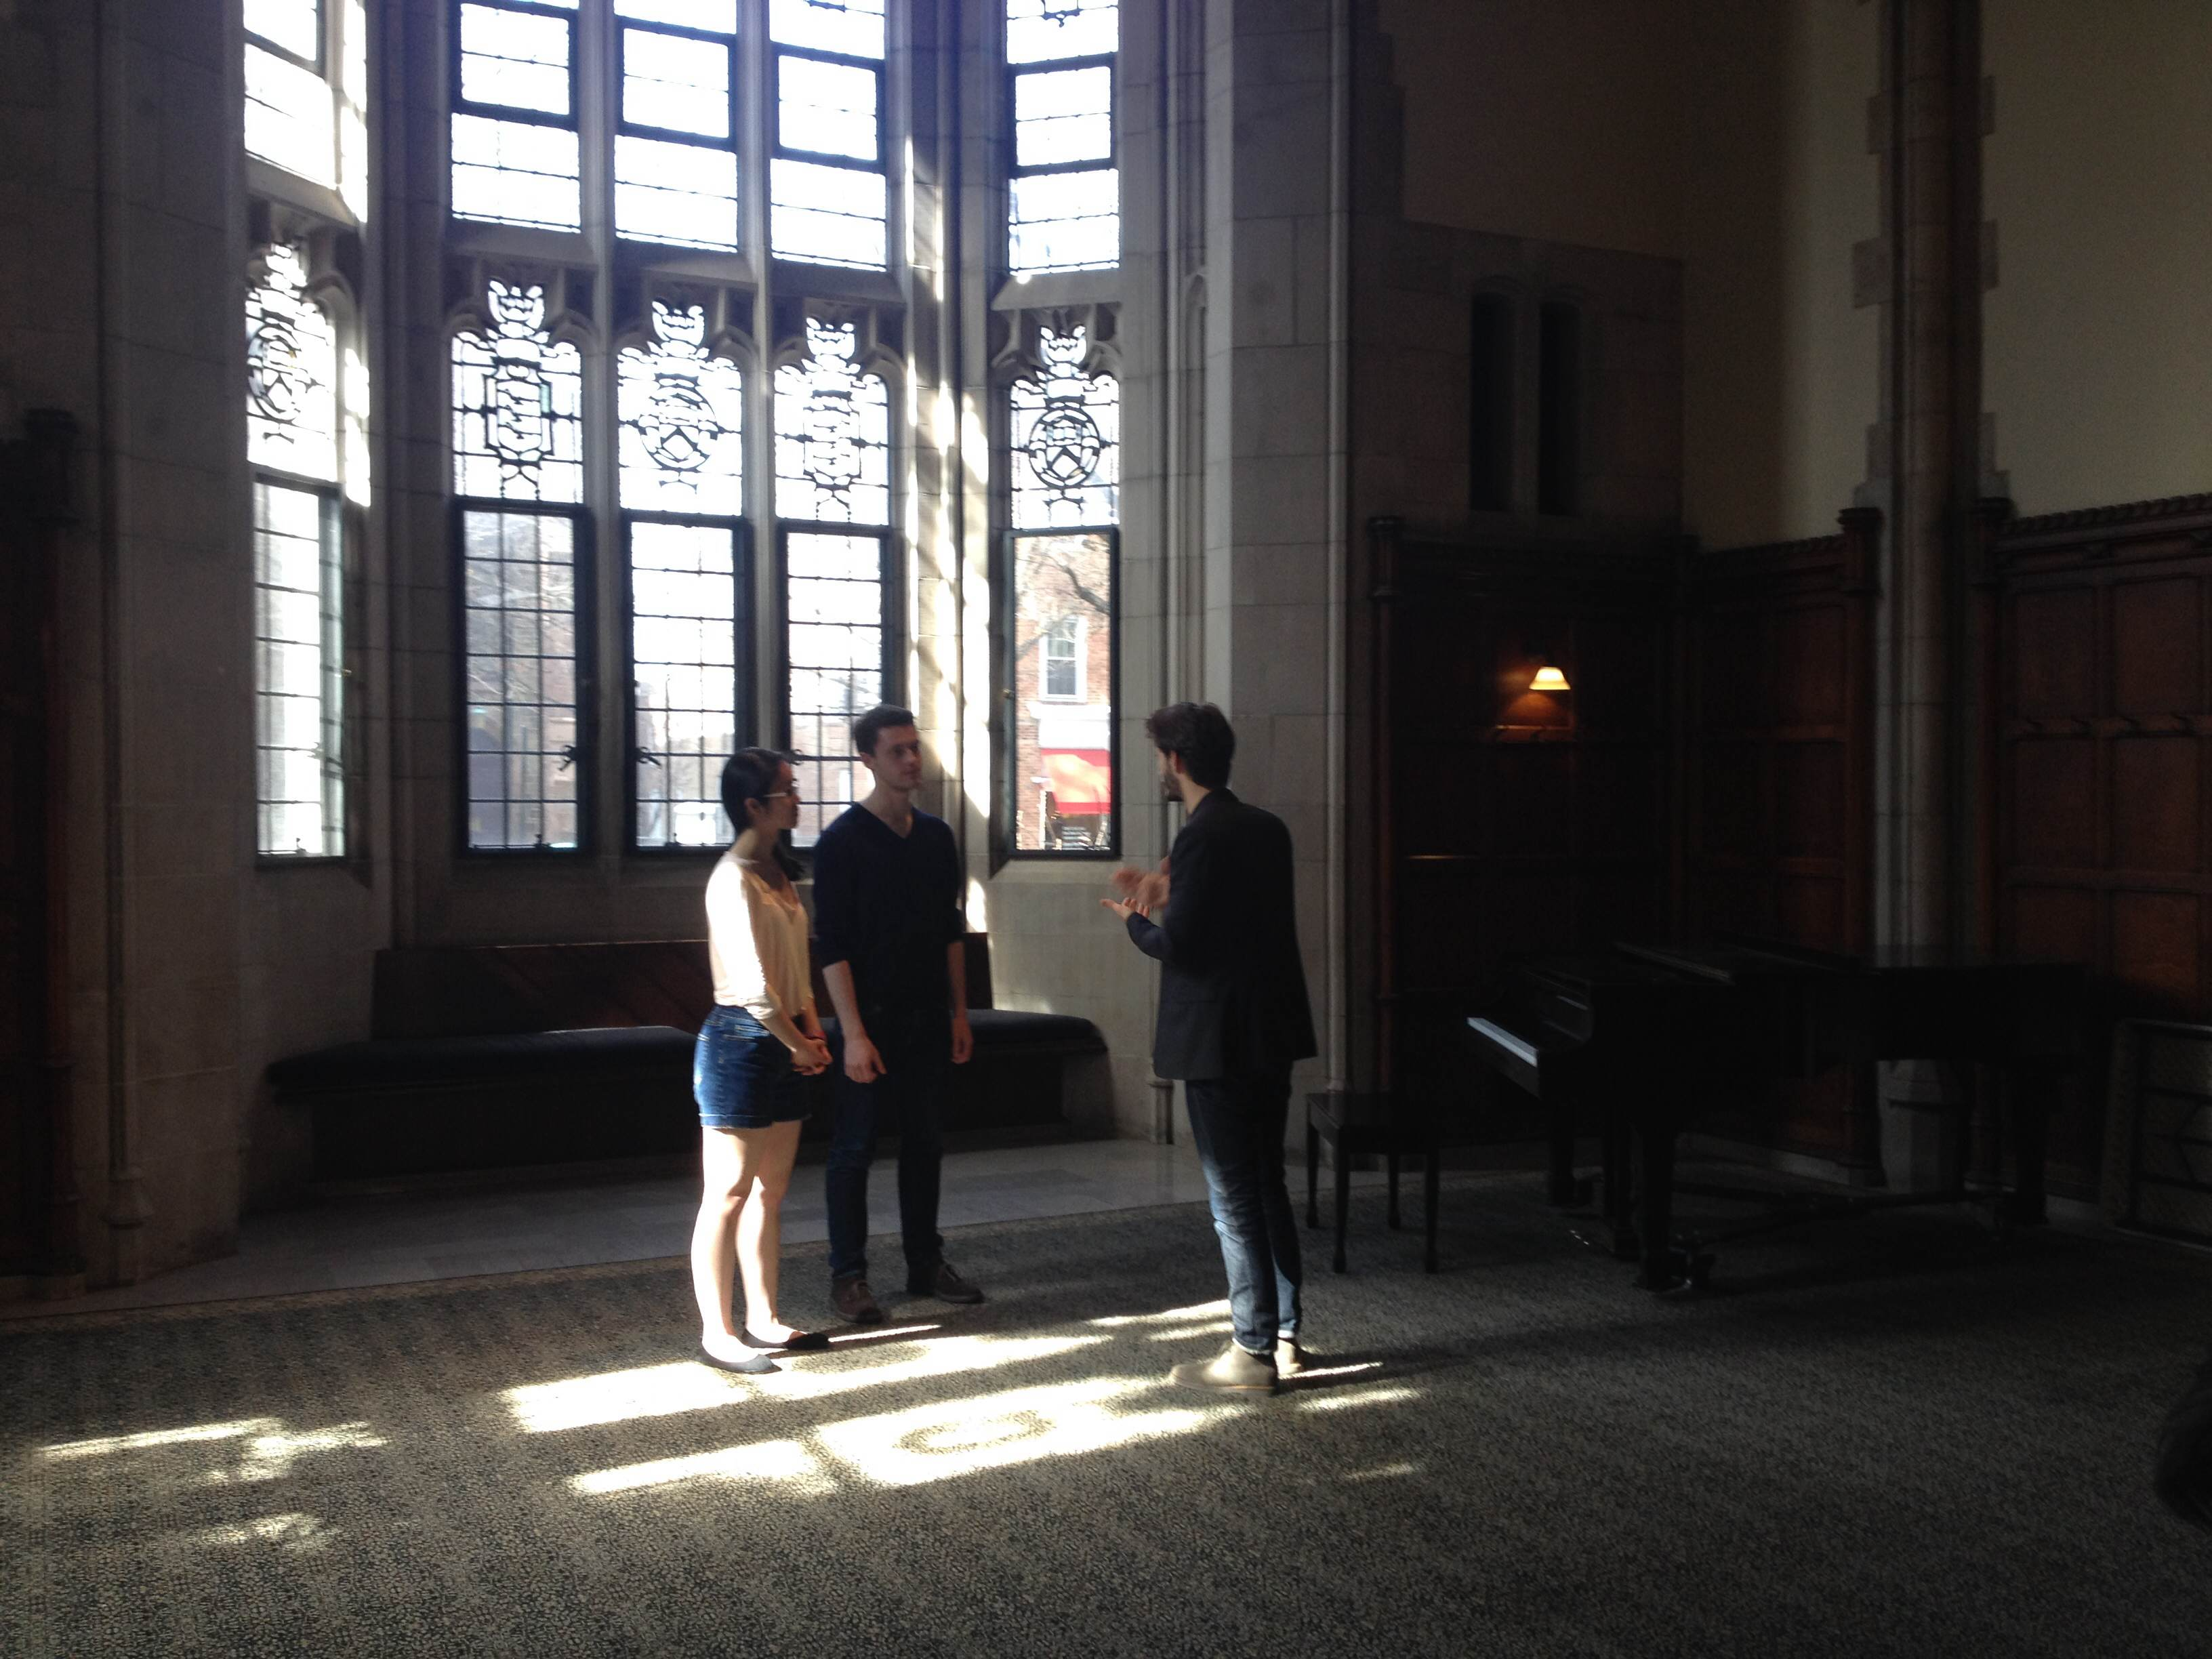 pierre niney and princeton take two university press club